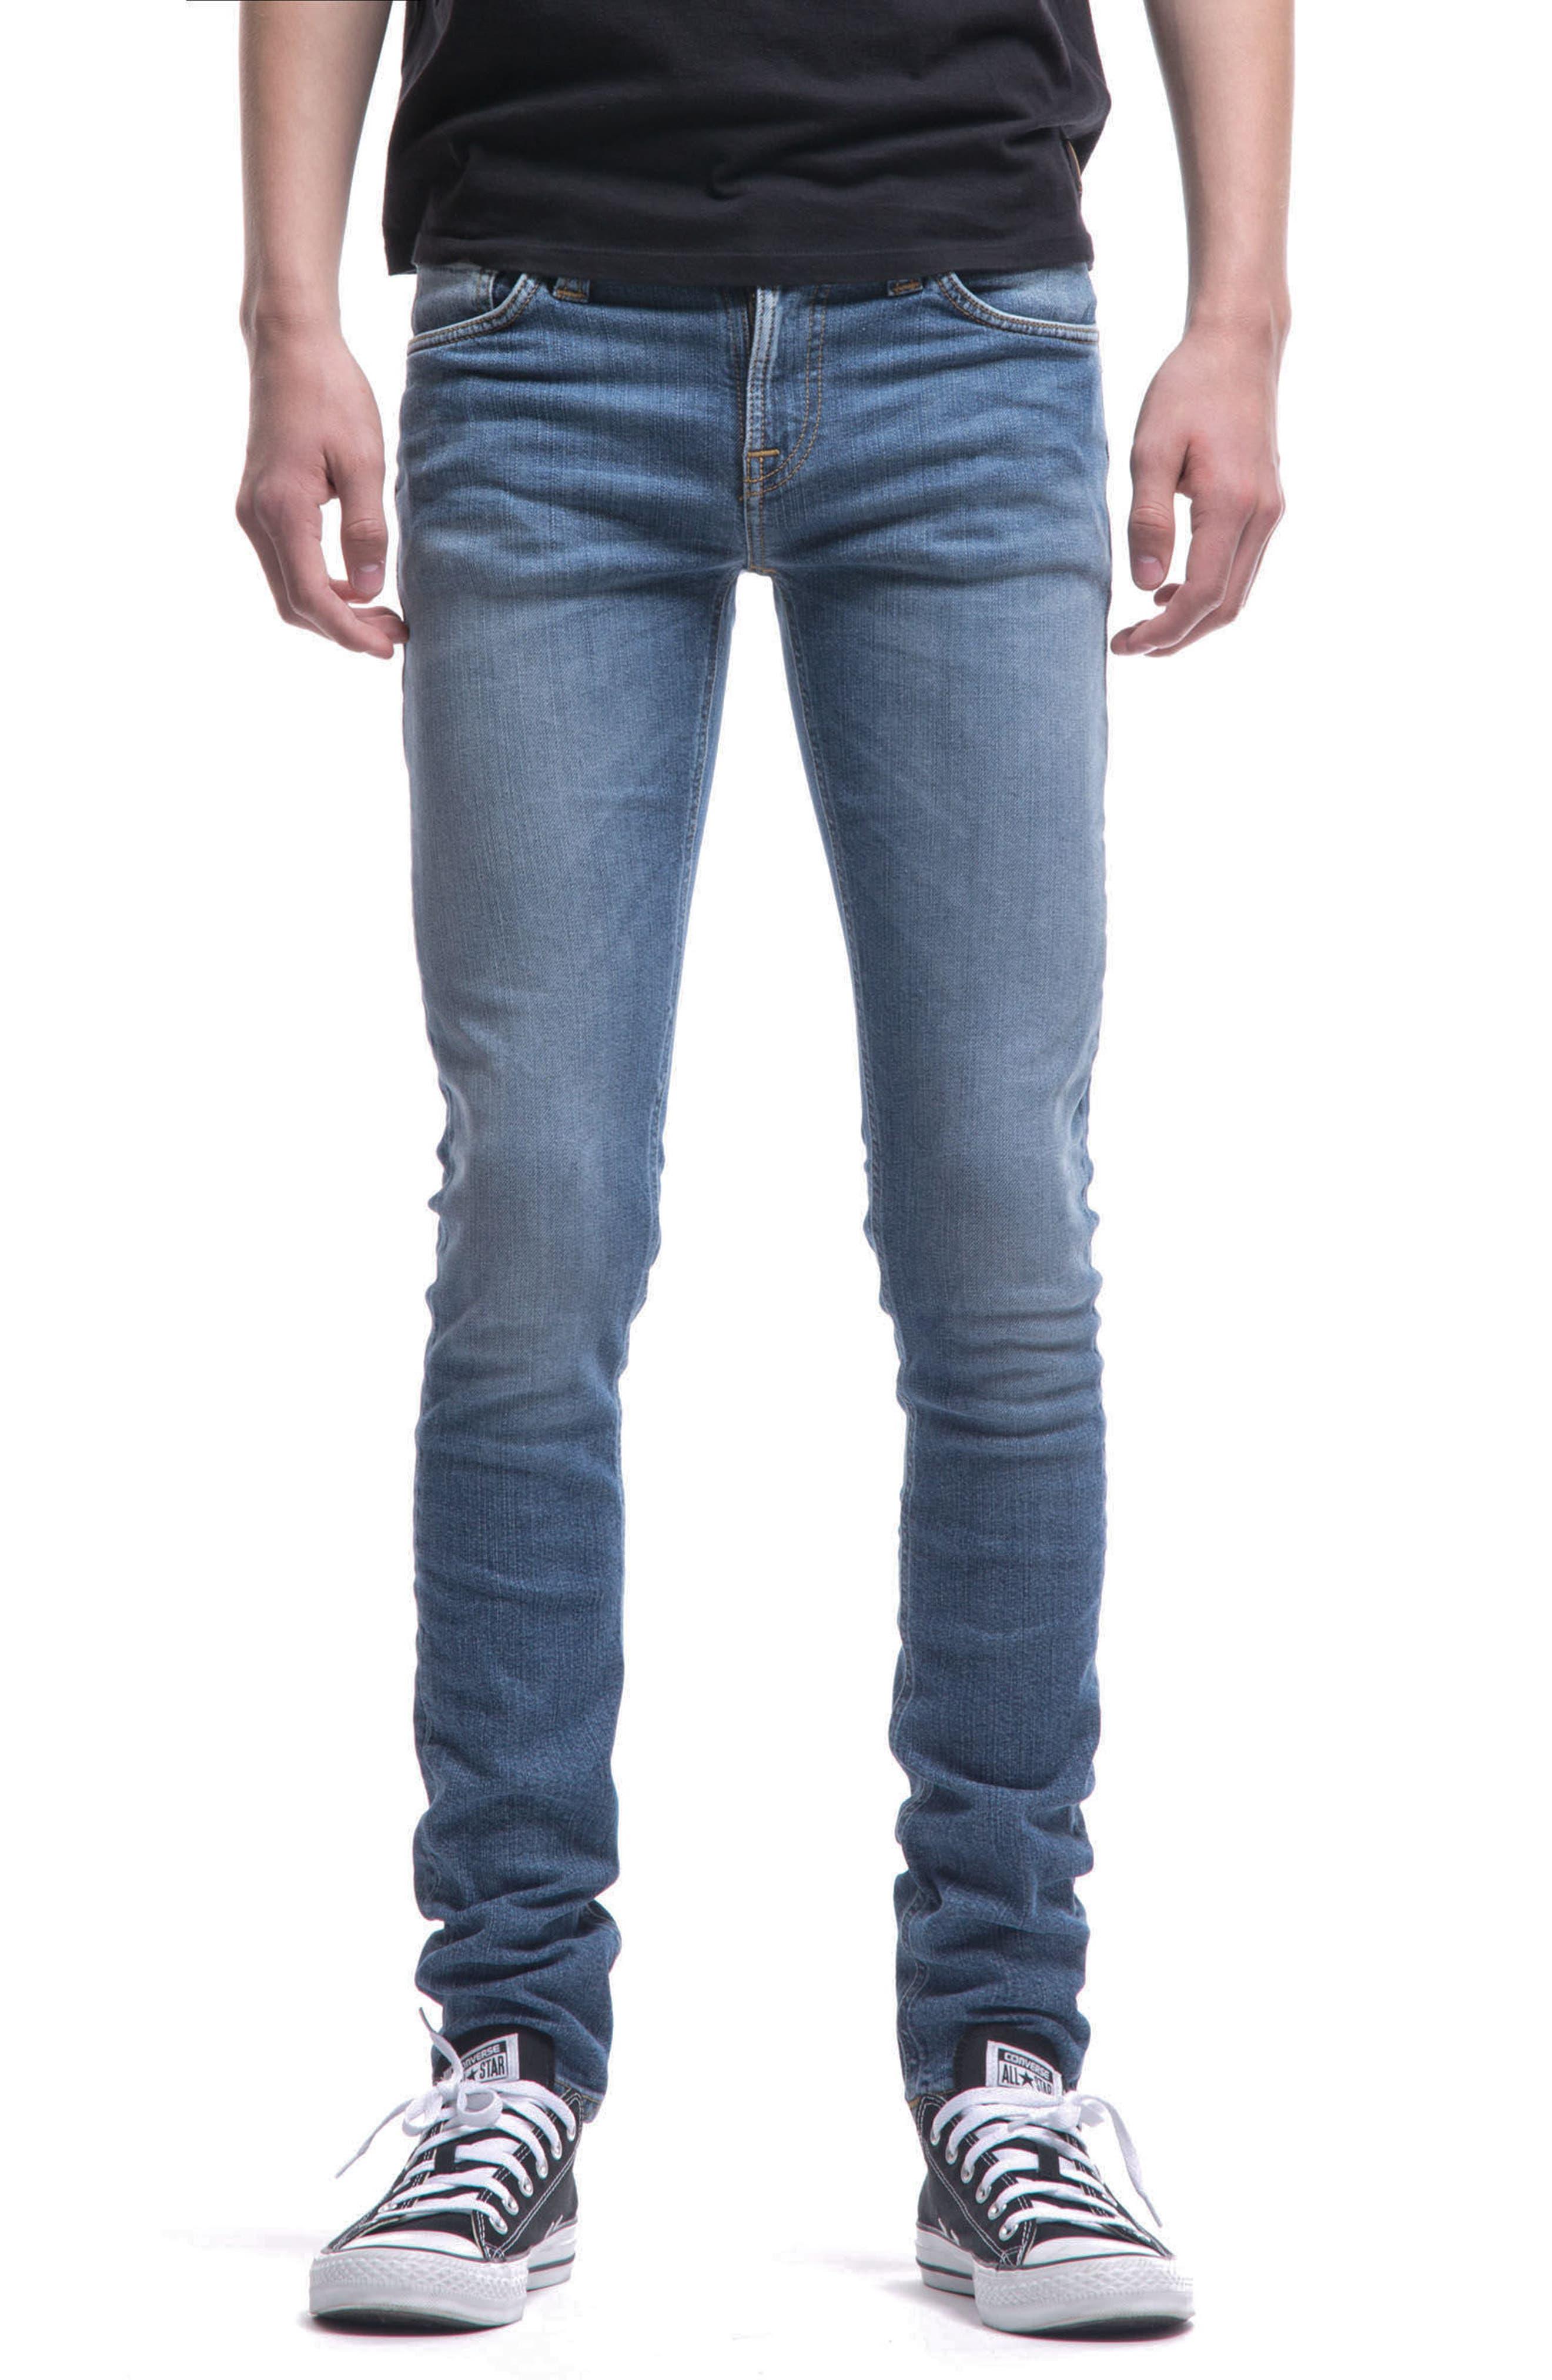 Main Image - Nudie Jeans Skinny Lin Skinny Fit Jeans (Celestial)